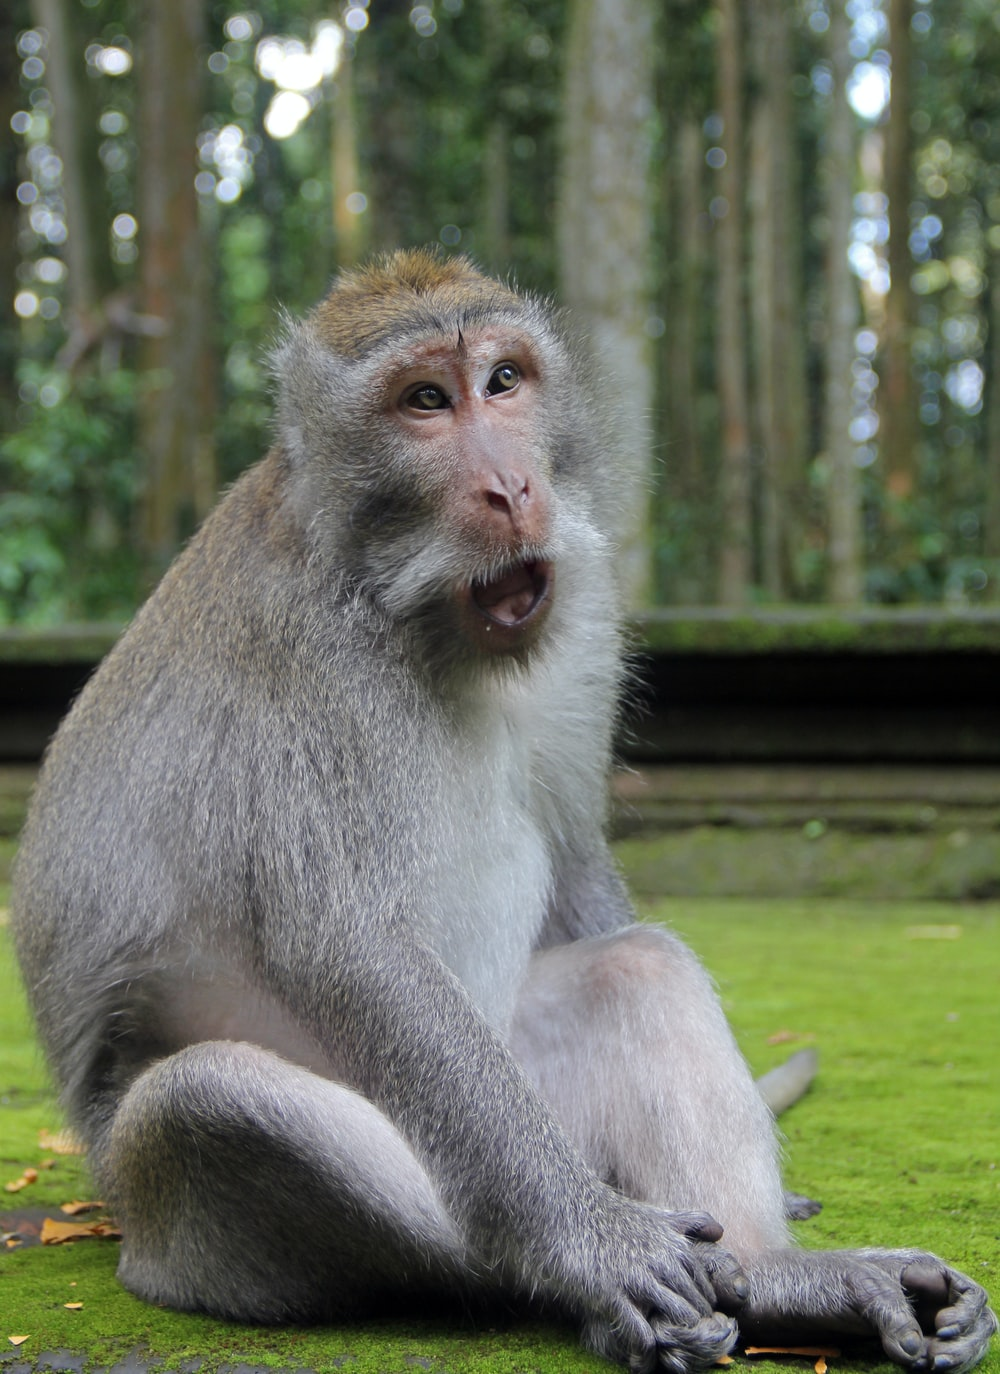 gray monkey sitting on green grass during daytime